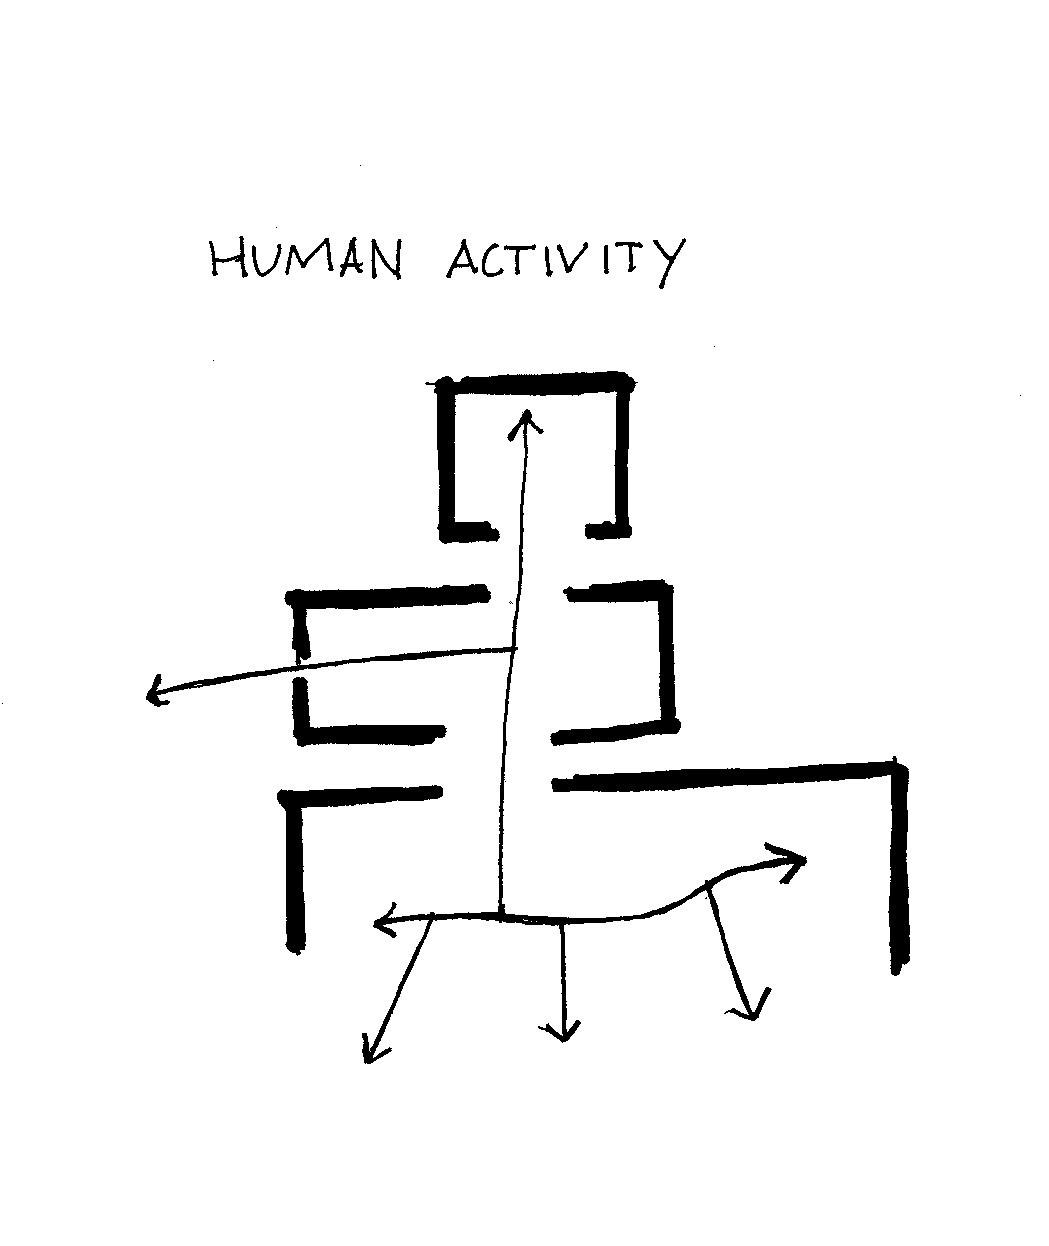 Accounting Diagram Activity